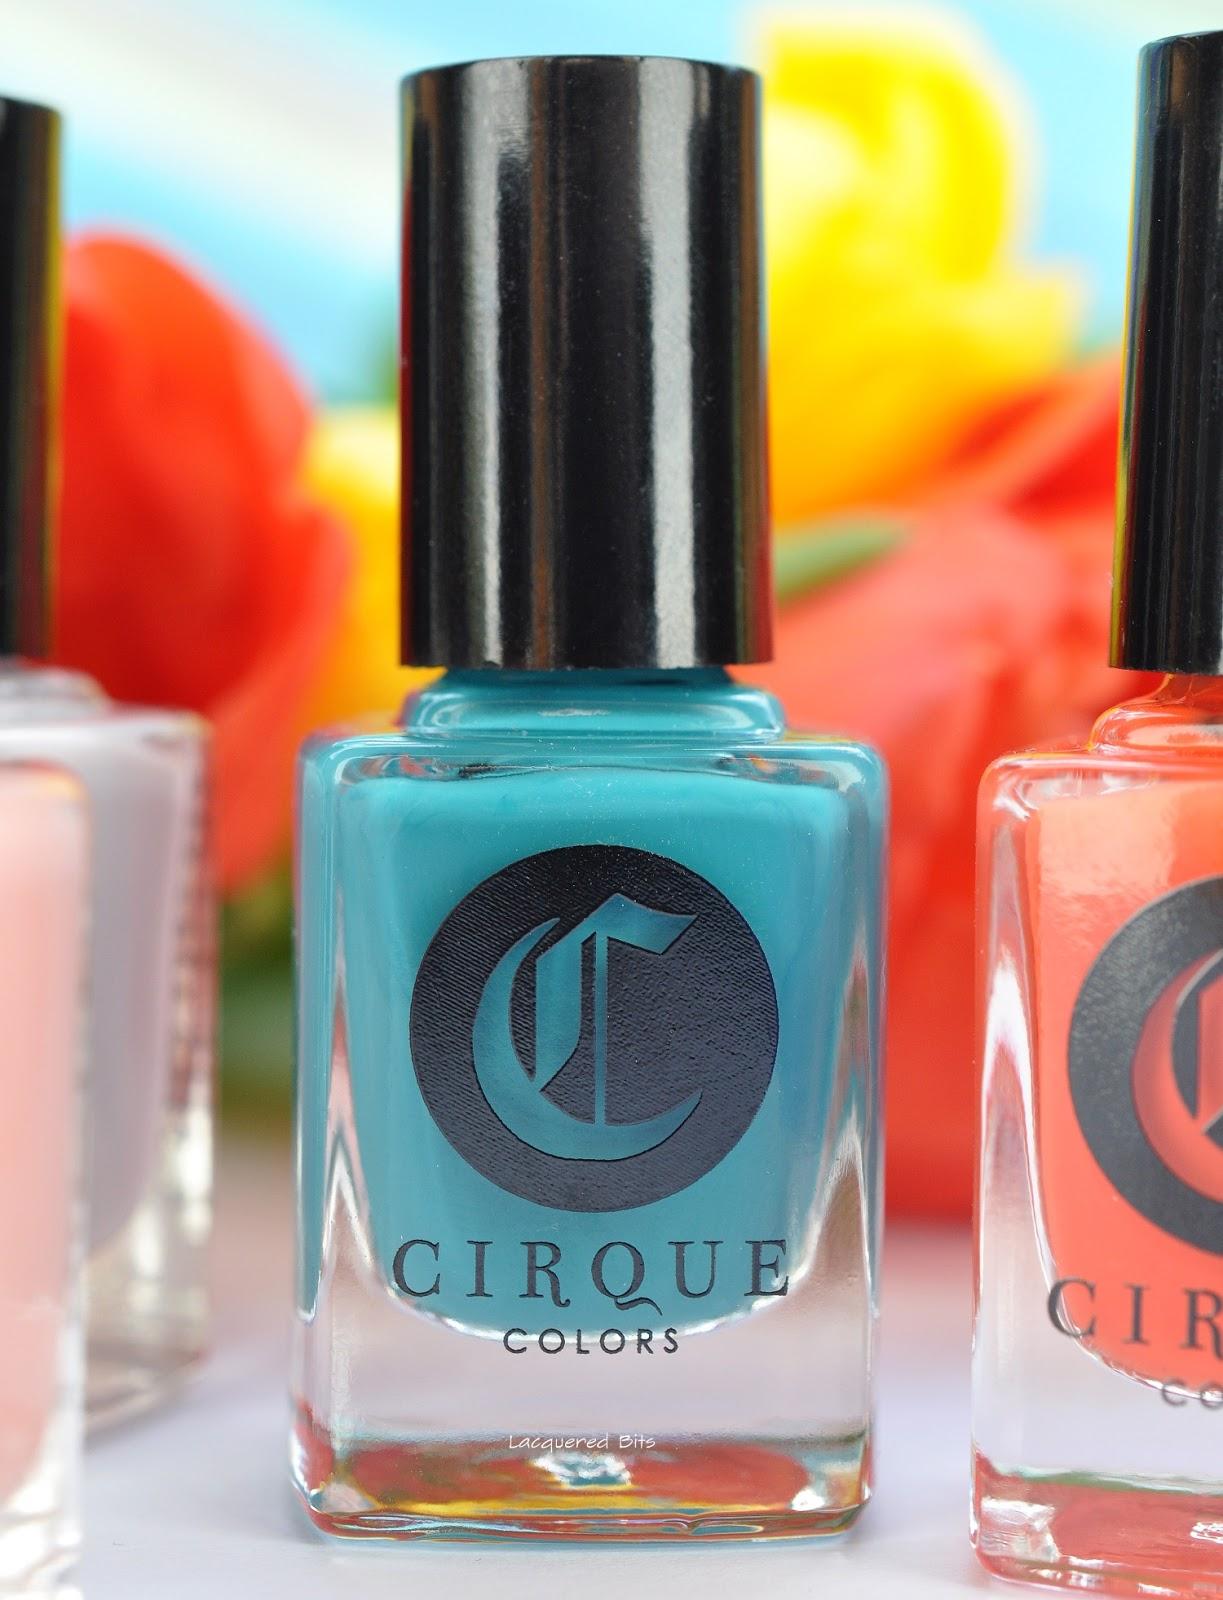 Mermaid Parade - Cirque Colors Spring/Summer 2016